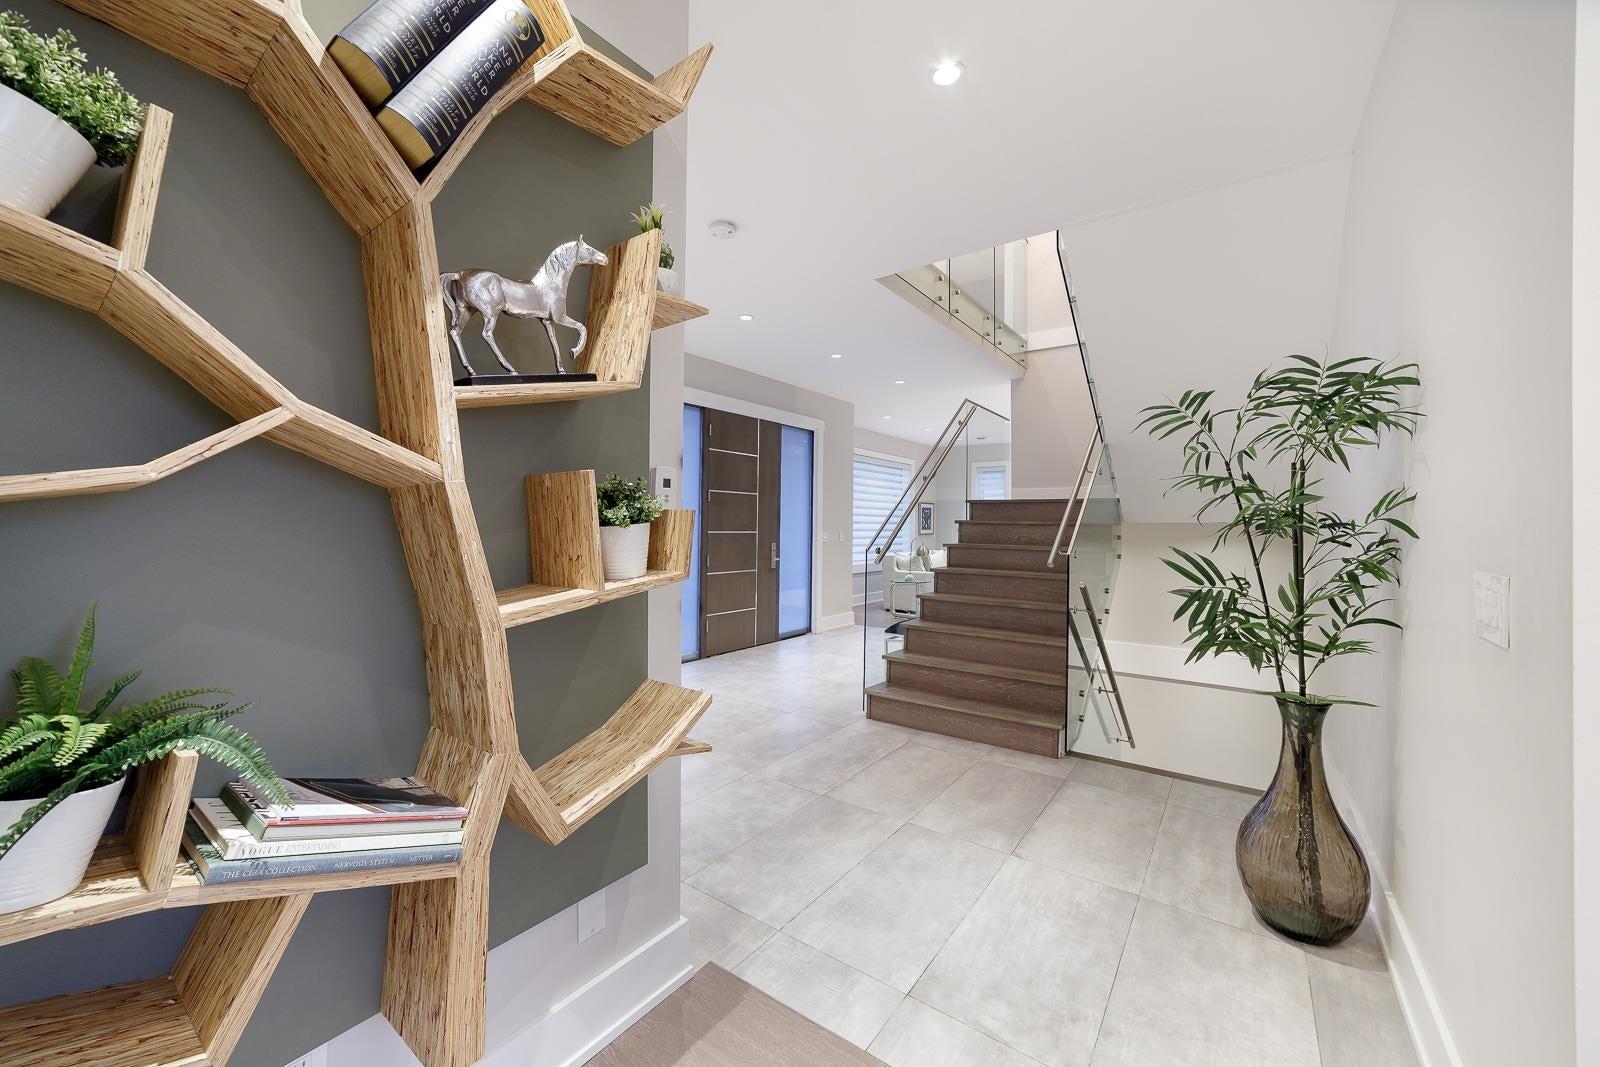 517 GRANADA CRESCENT - Upper Delbrook House/Single Family for sale, 8 Bedrooms (R2615057) - #5